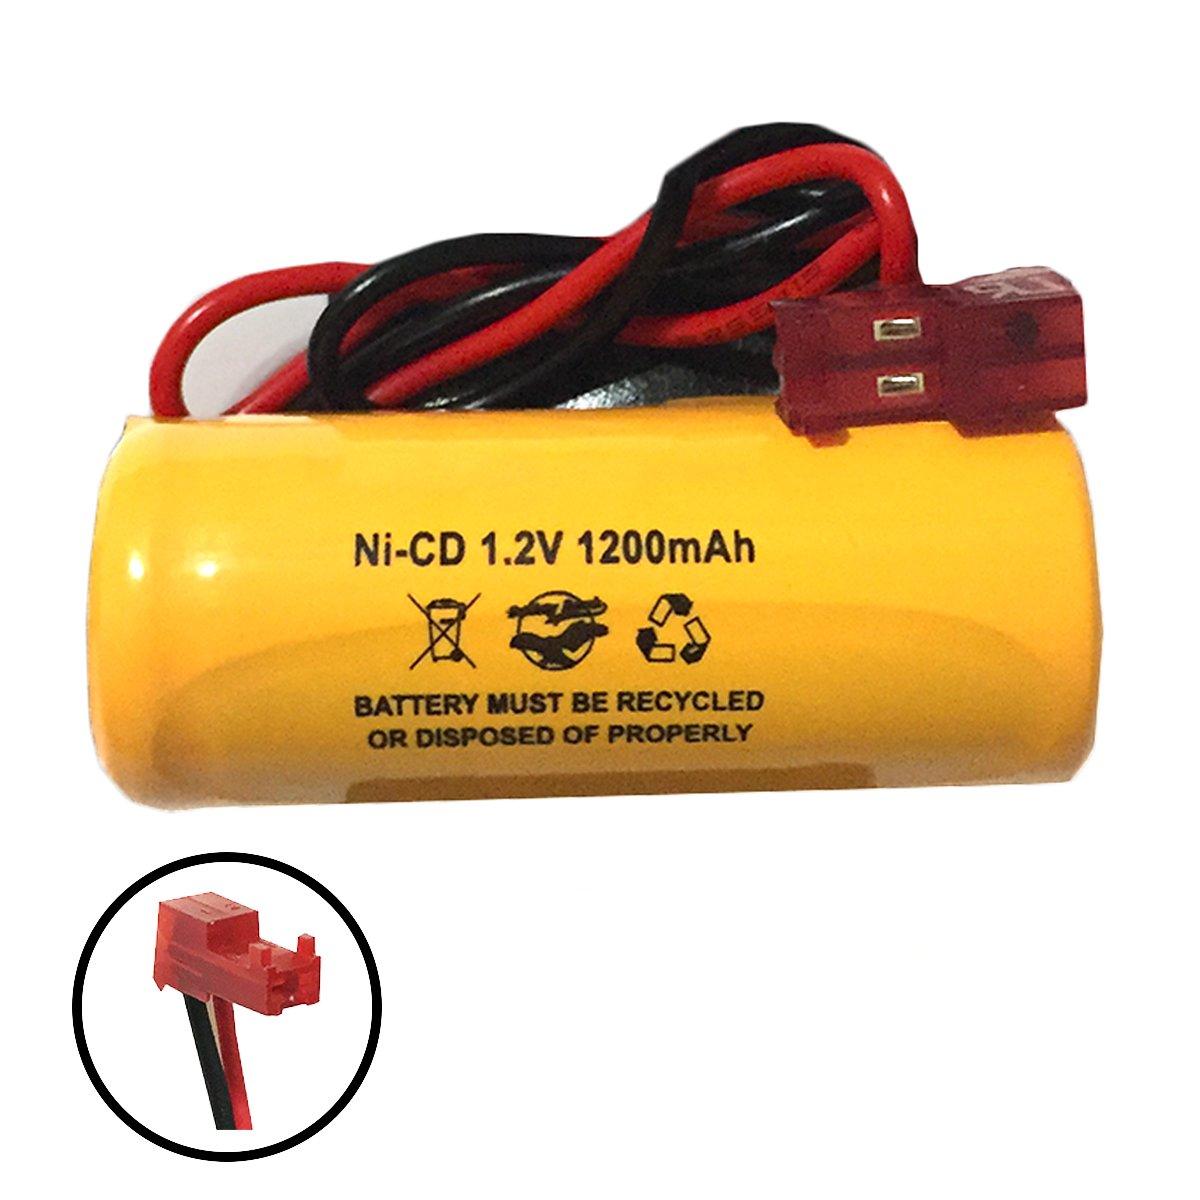 1.2V 1000mAh Exit Sign Battery Lithonia elb1p201n2 ELB1P2901N ELB1P201NLQMSW3R12277ELW NiCd Nickel Cadmium Emergency Light 1200mAh 1400mah 1ah 1.2ah red connector (10 Pack) by Battery Hawk (Image #2)